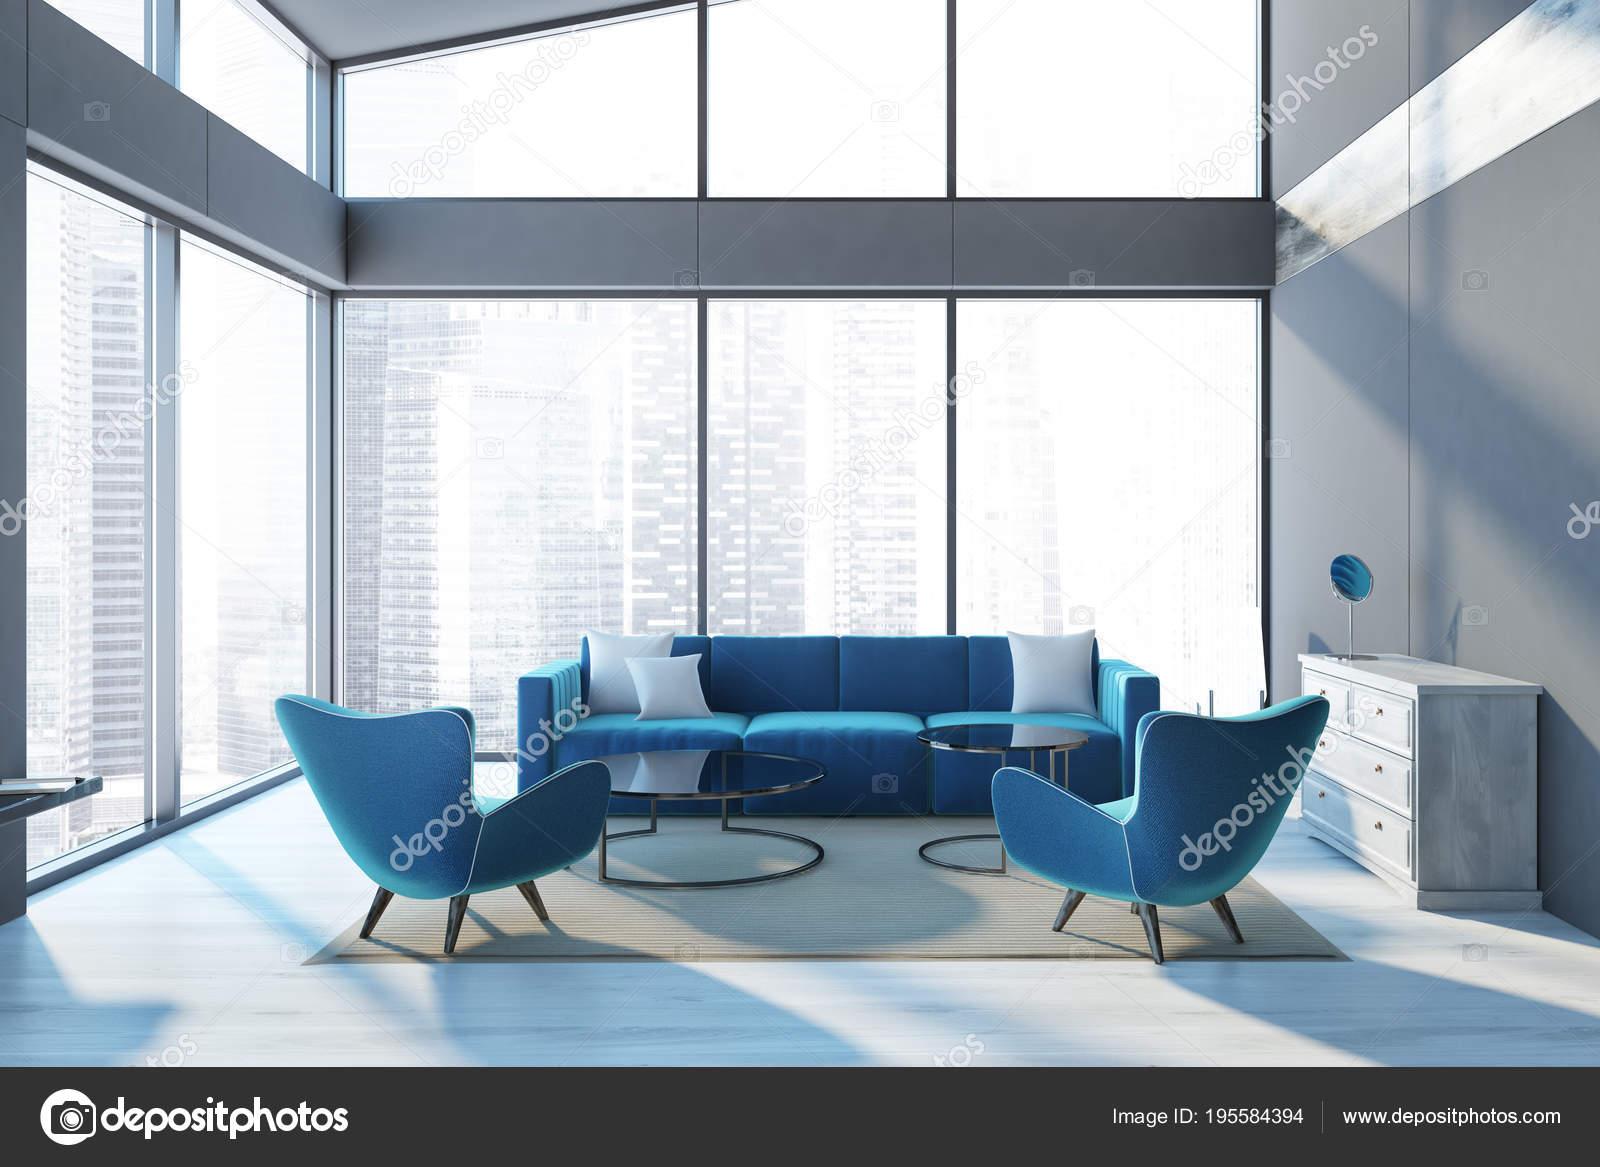 Panorama penthouse sofa im wohnzimmer blau u stockfoto